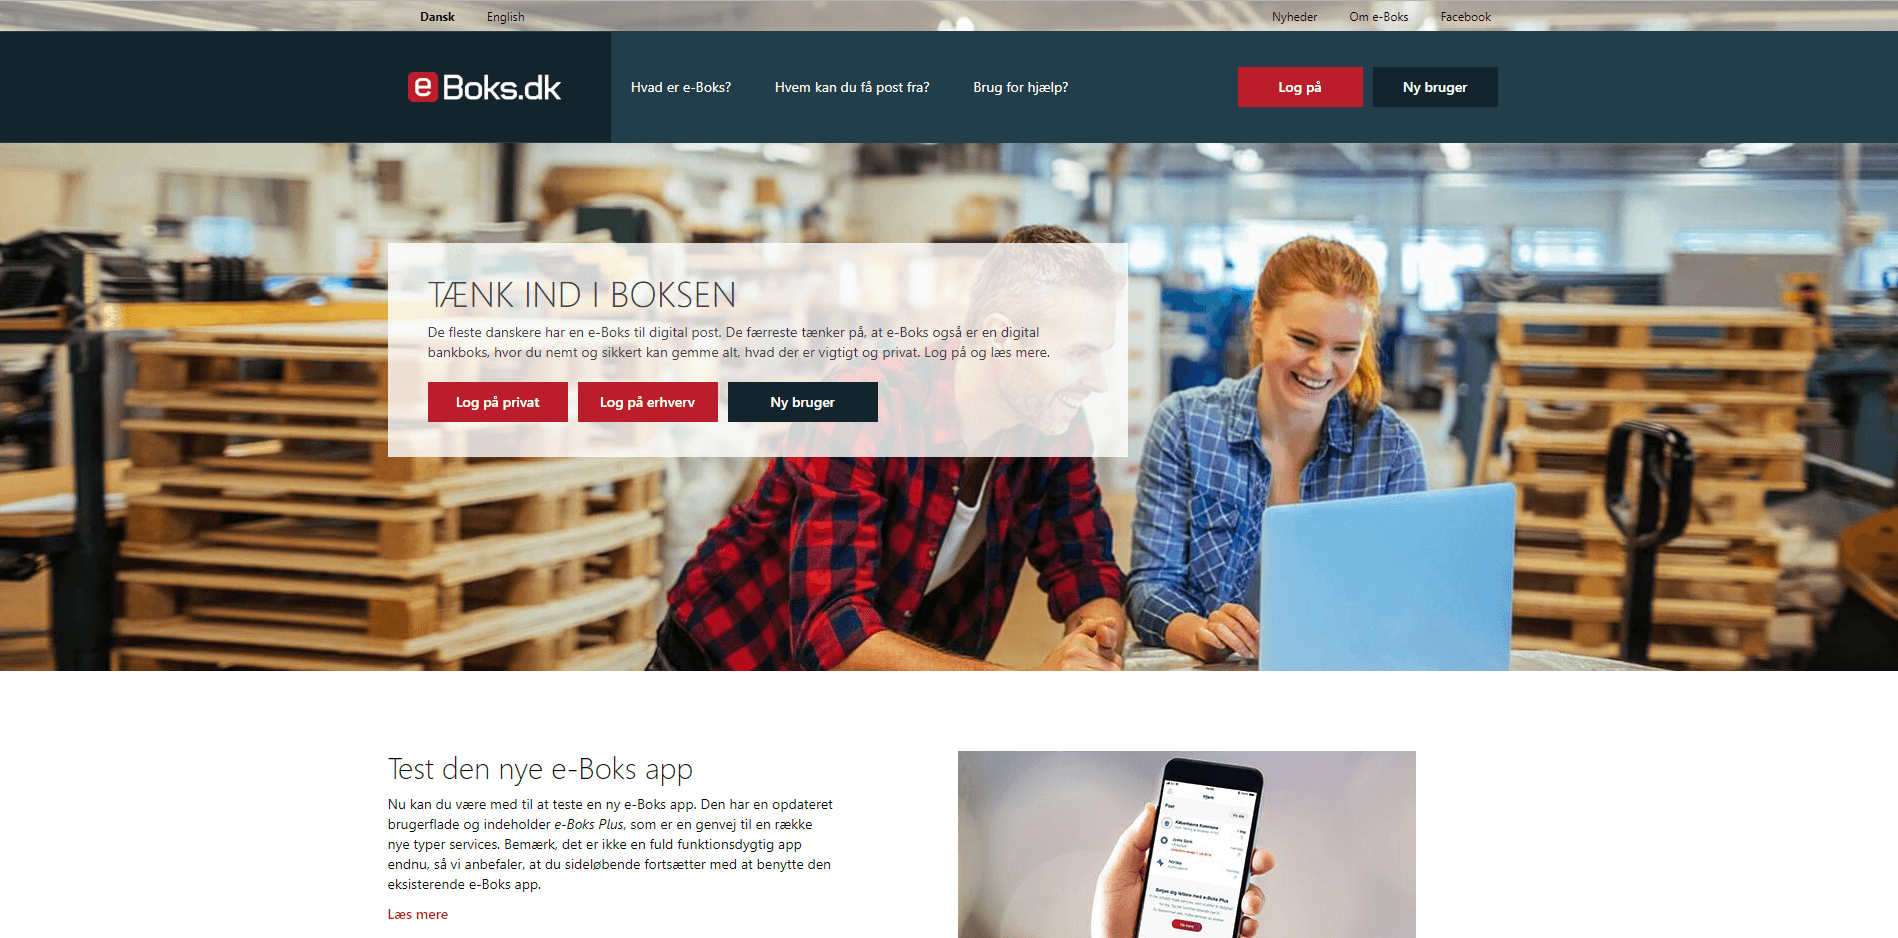 eboks website's picture